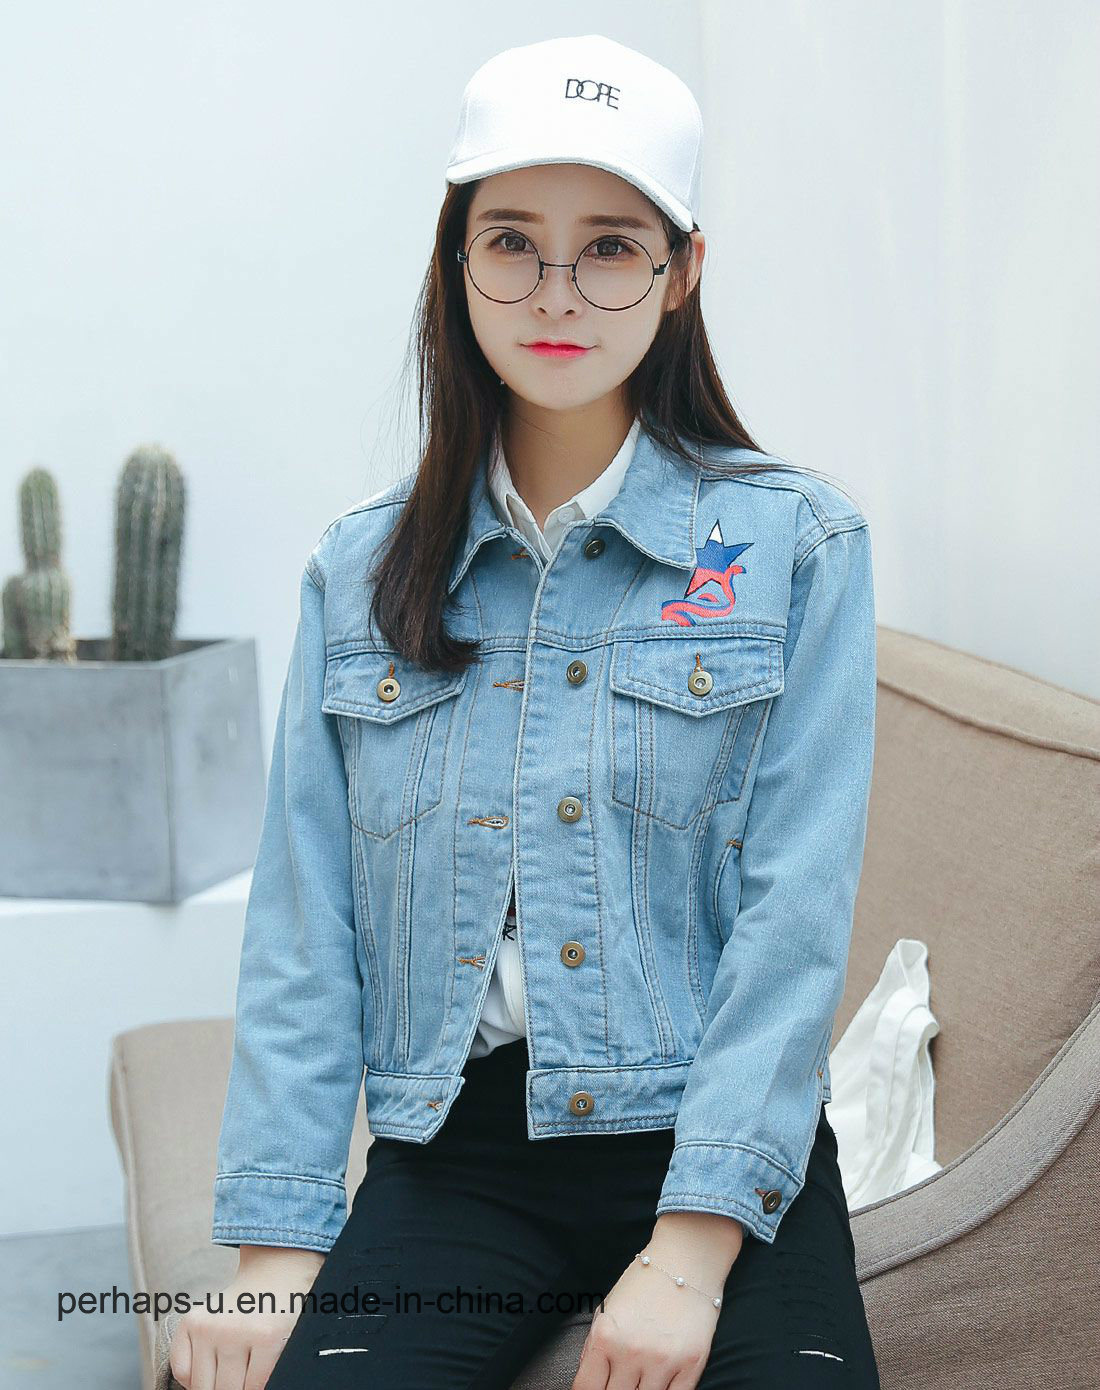 0ad14c2021b5 China OEM Lady Light Blue Denim Jacket with Embroidered - China Women  Clothing